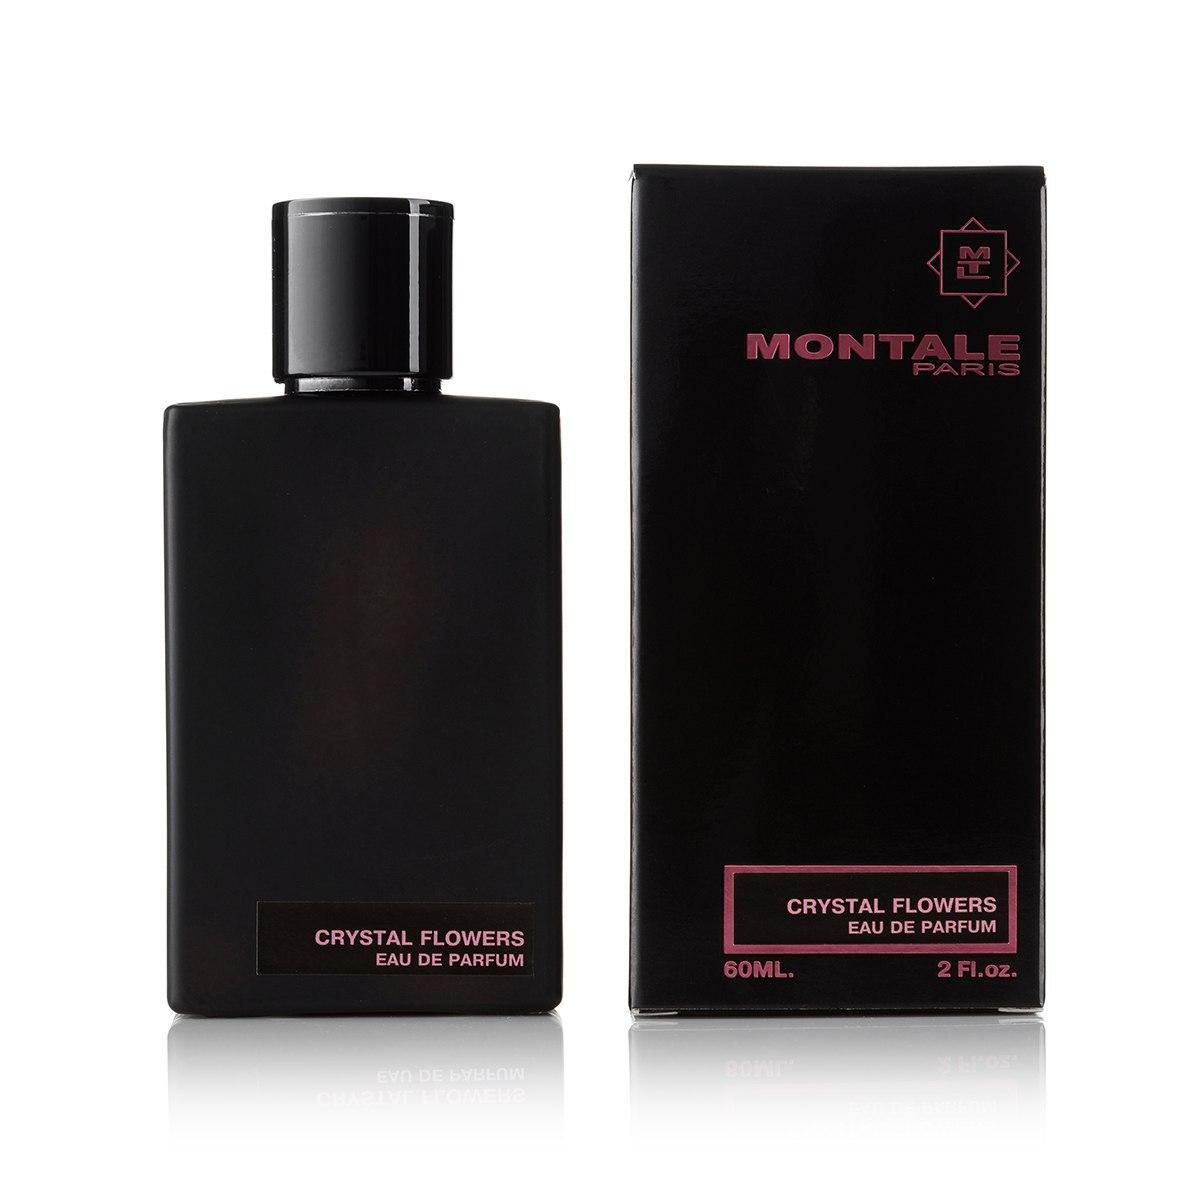 60 мл мини-парфюм Montale Crystal Flowers (унисекс) - M-32